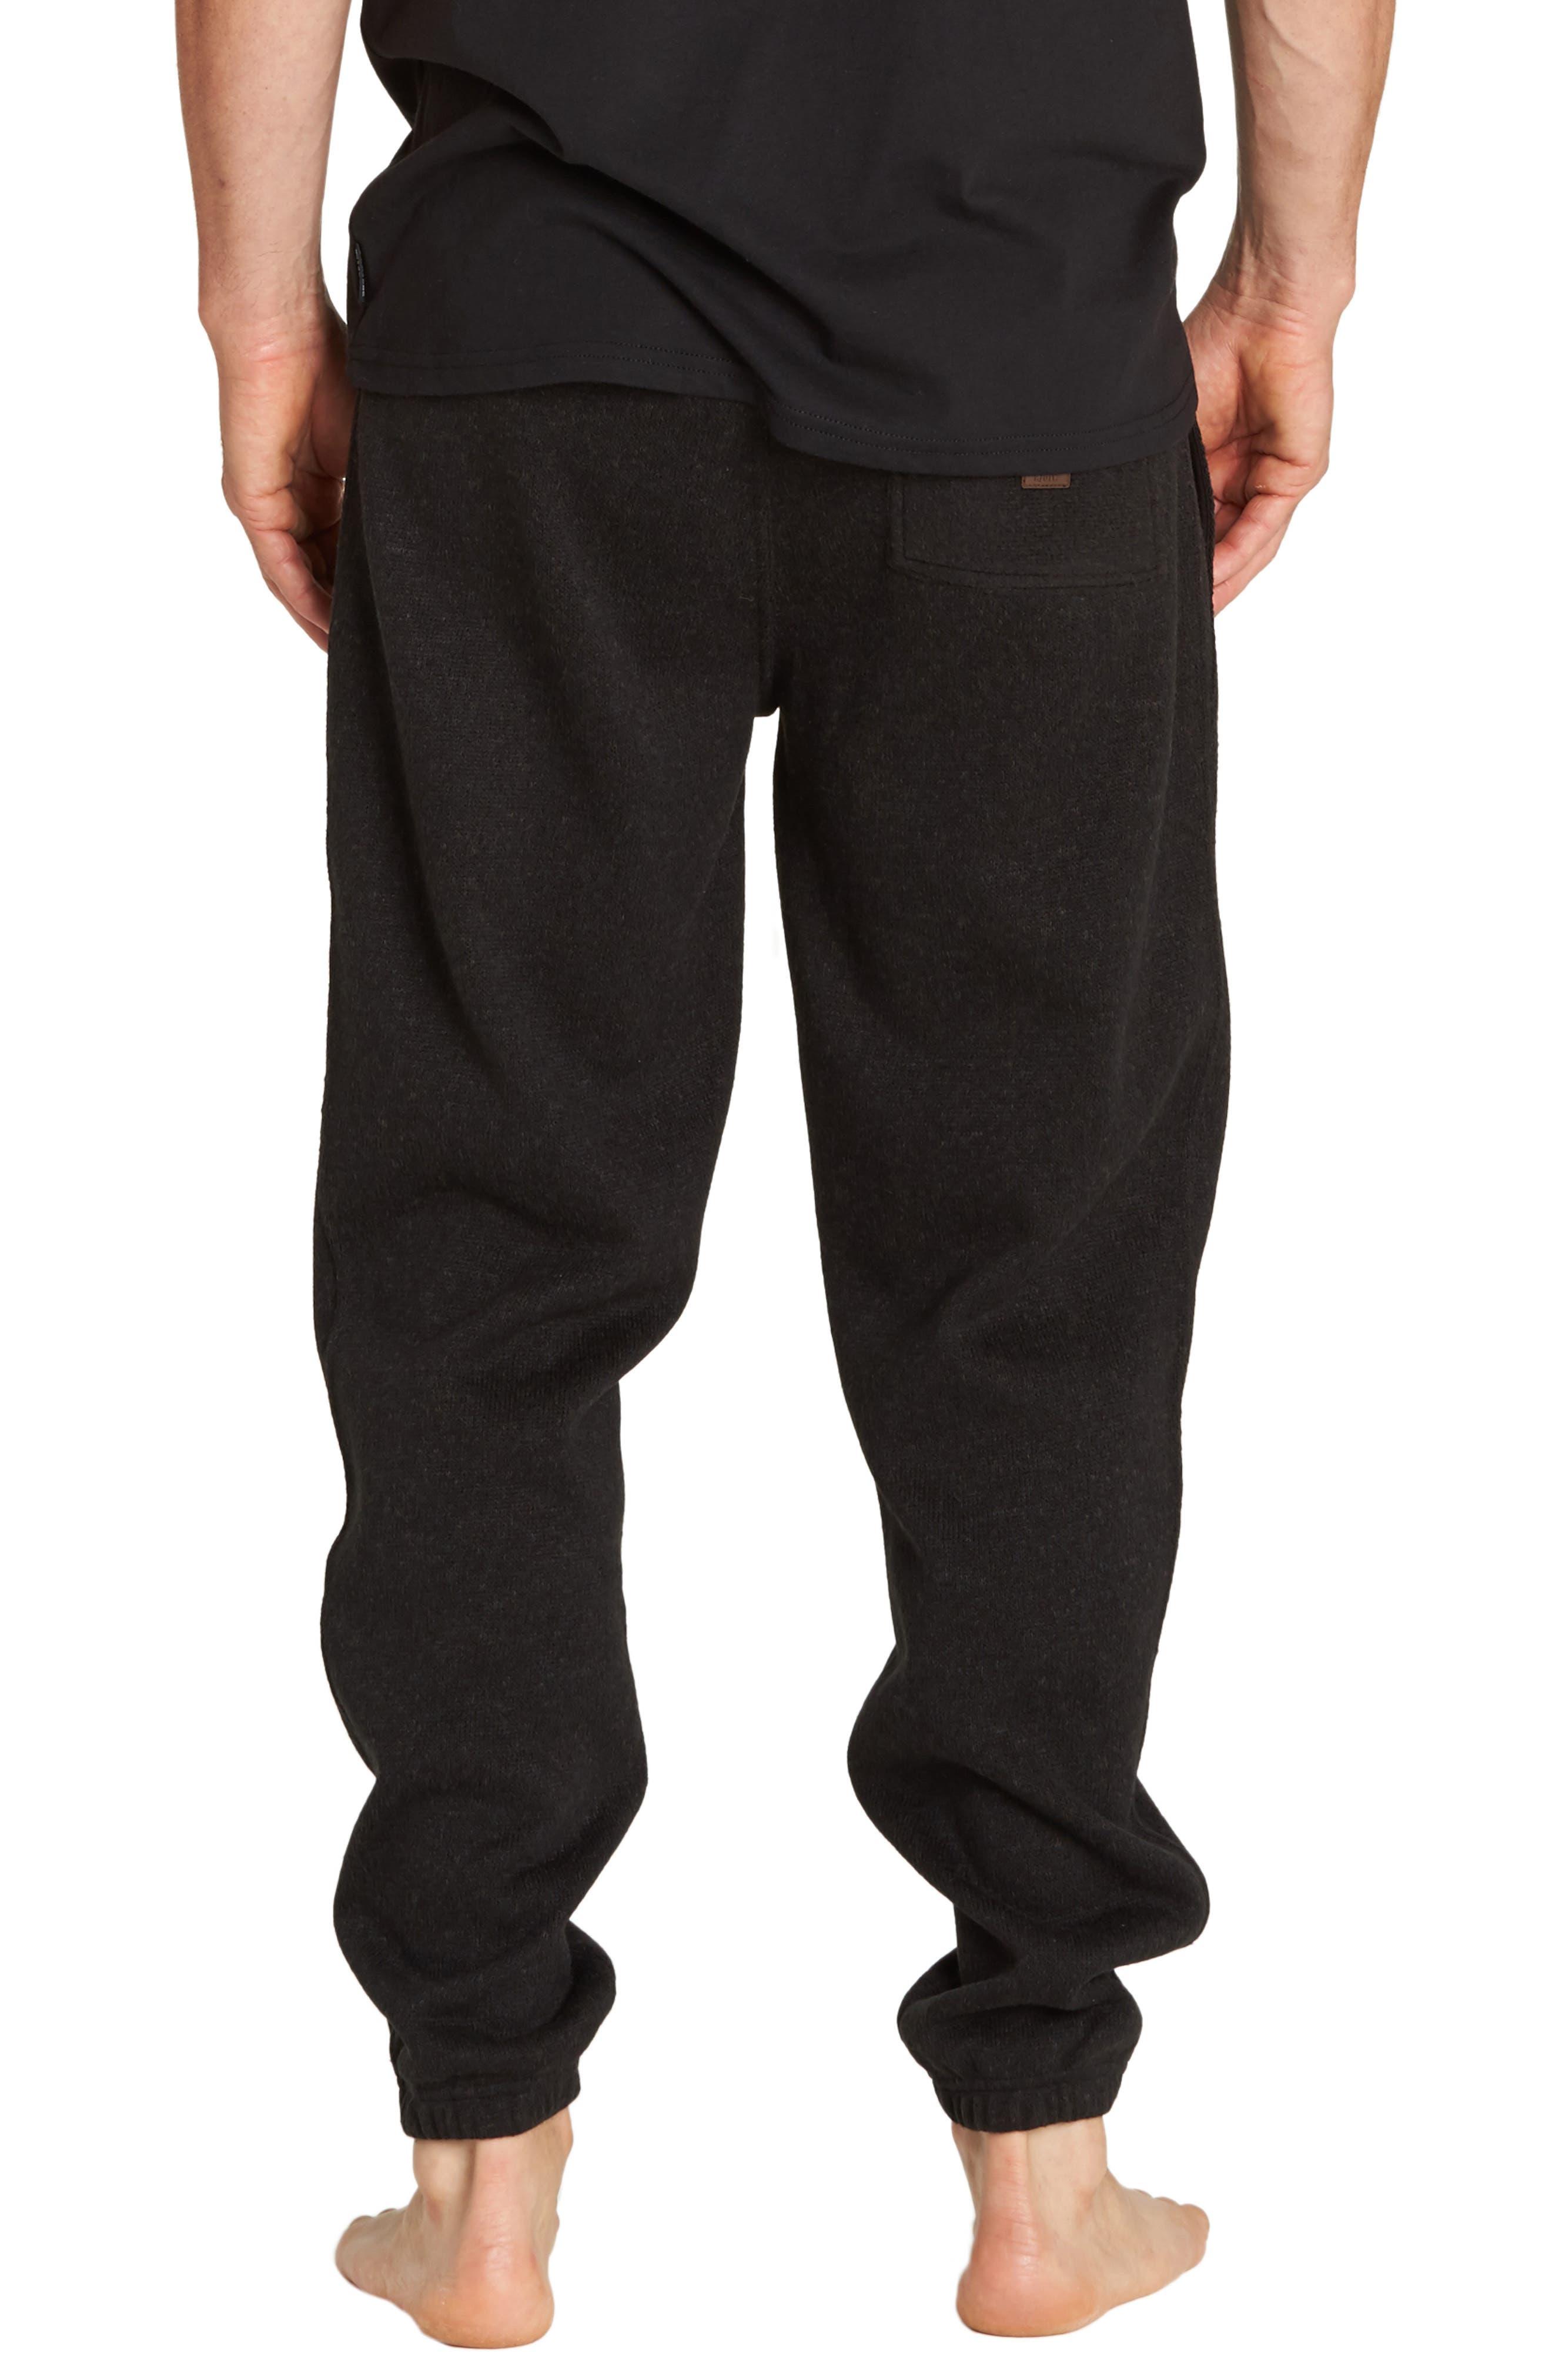 Boundary Sweatpants,                             Alternate thumbnail 2, color,                             BLACK HEATHER